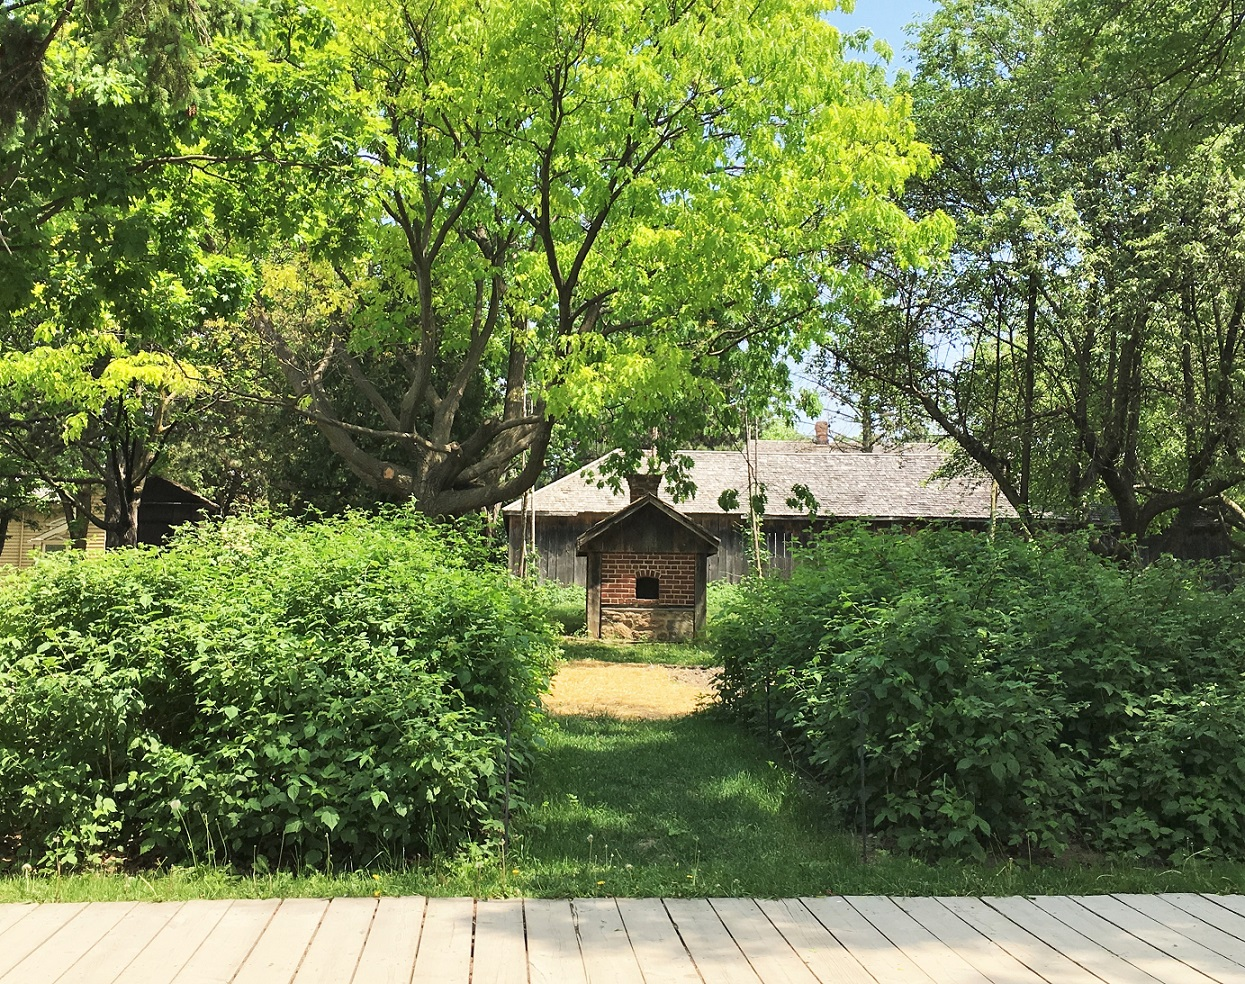 berry garden at Black Creek Pioneer Village